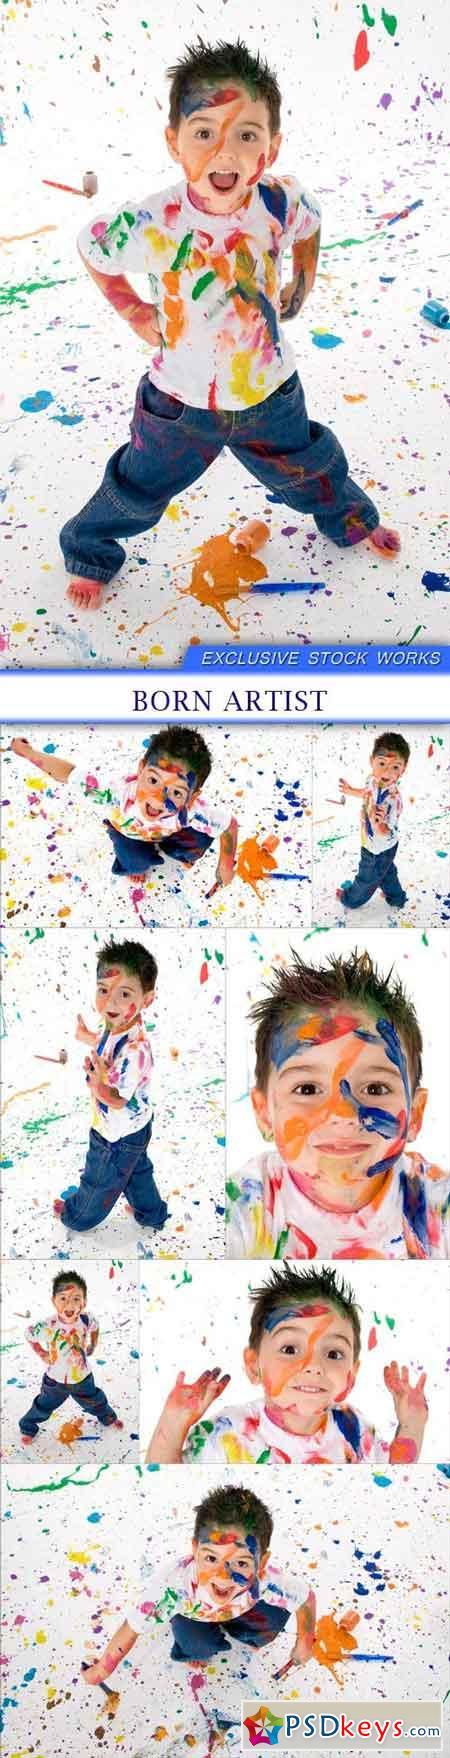 Boy born artist 7X JPEG